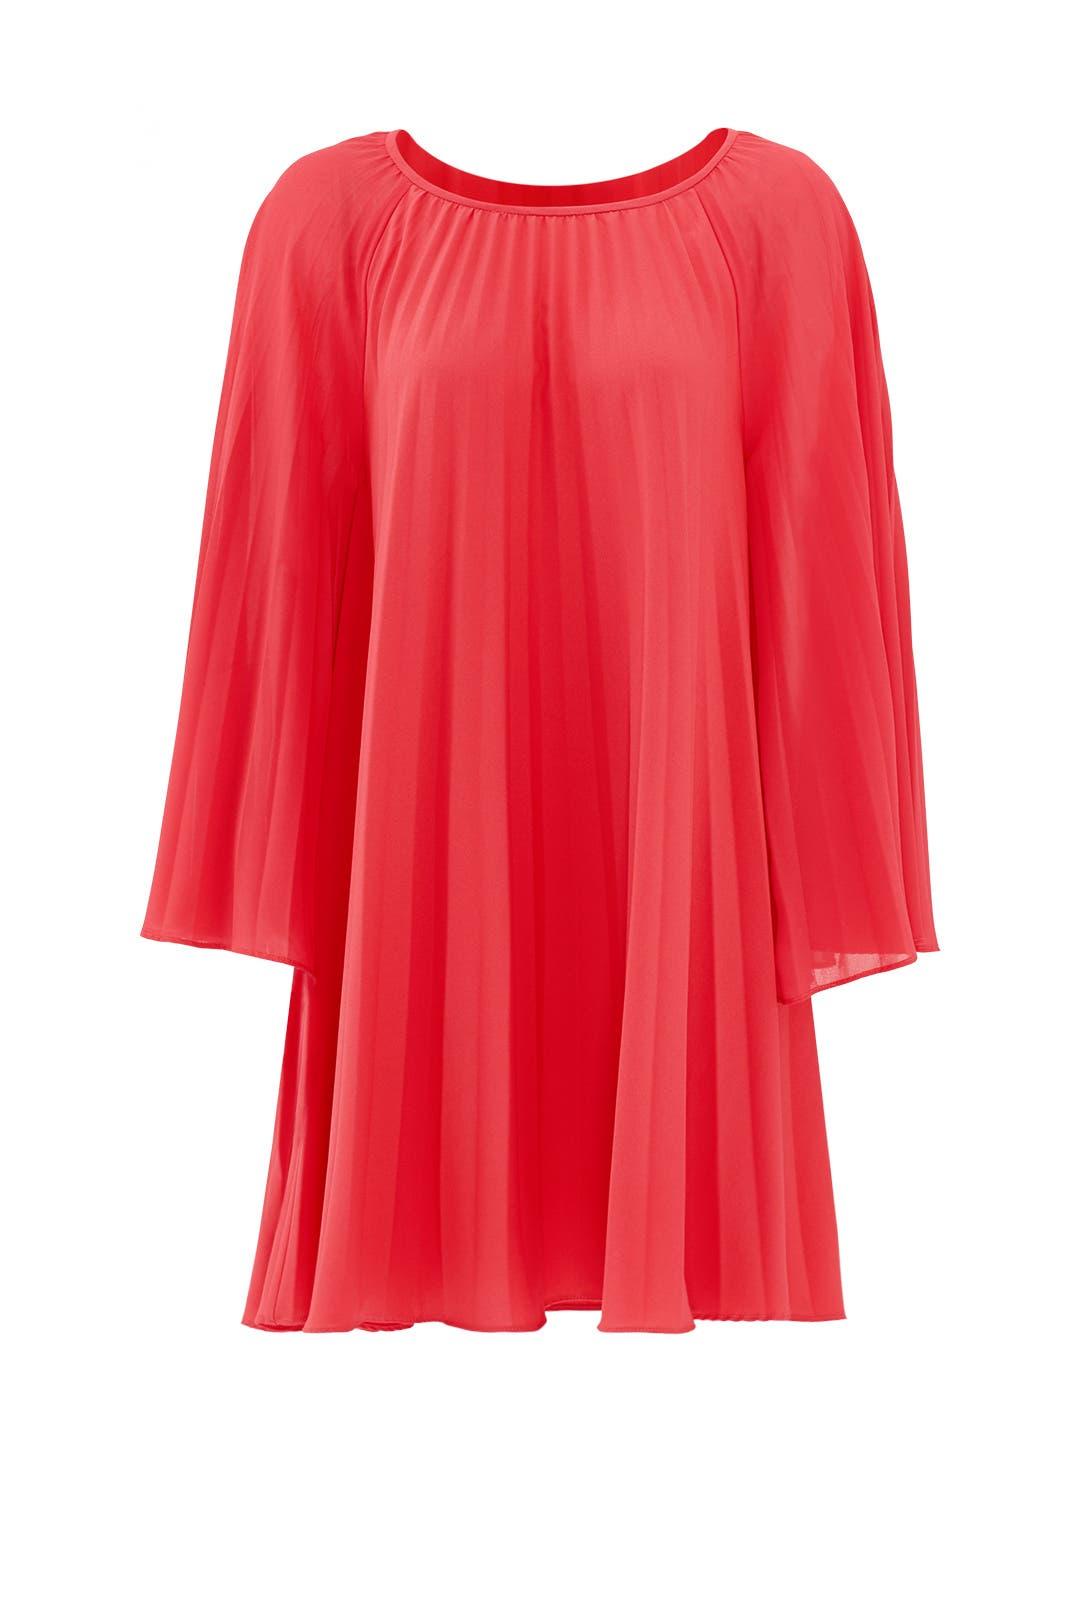 Merengue Pleat Dress by Nicole Miller